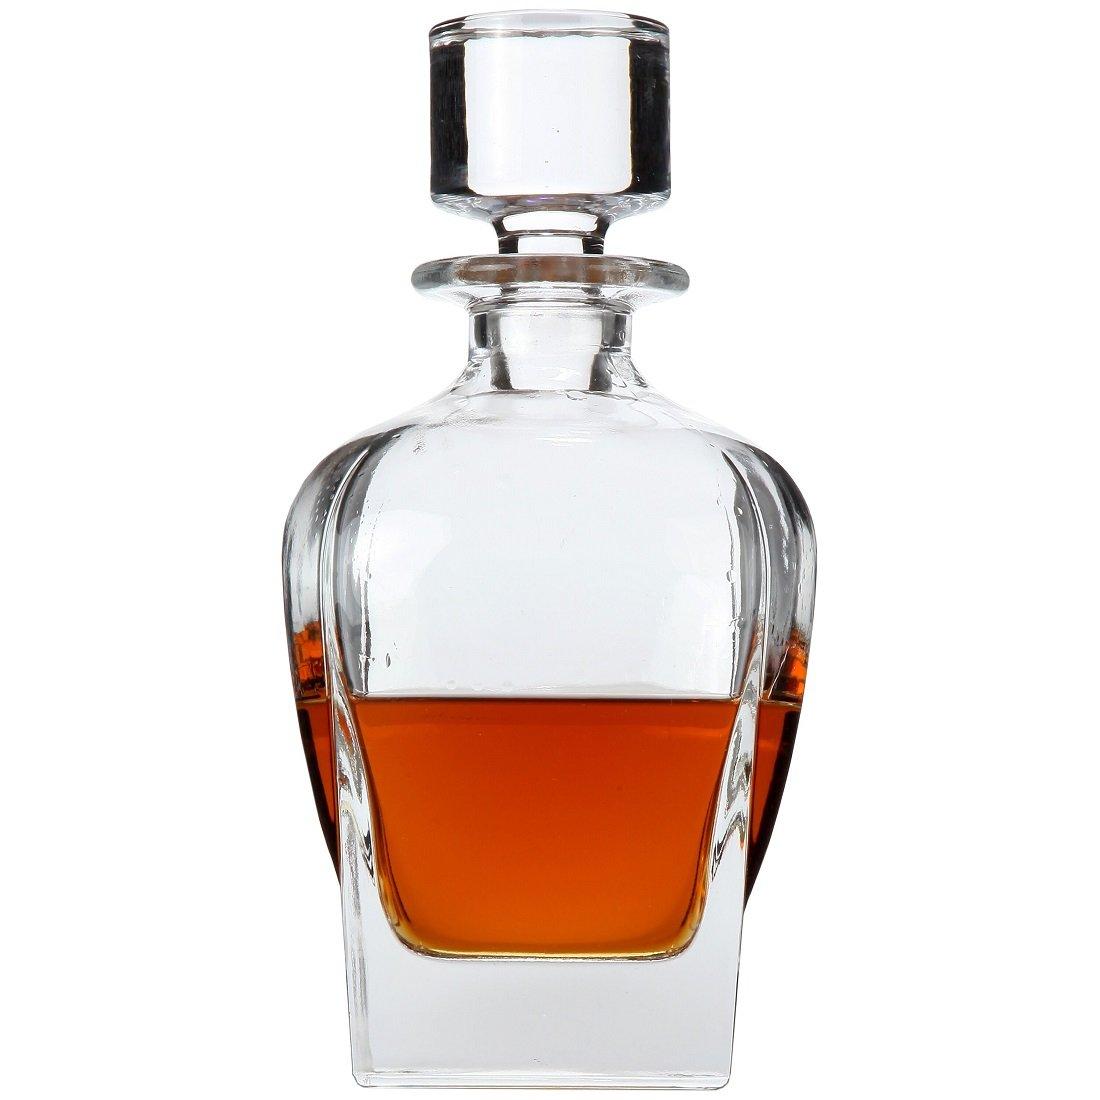 amazoncom  lily's home wine liquor and whiskey decanter with  - amazoncom  lily's home wine liquor and whiskey decanter with glassstopper decanters